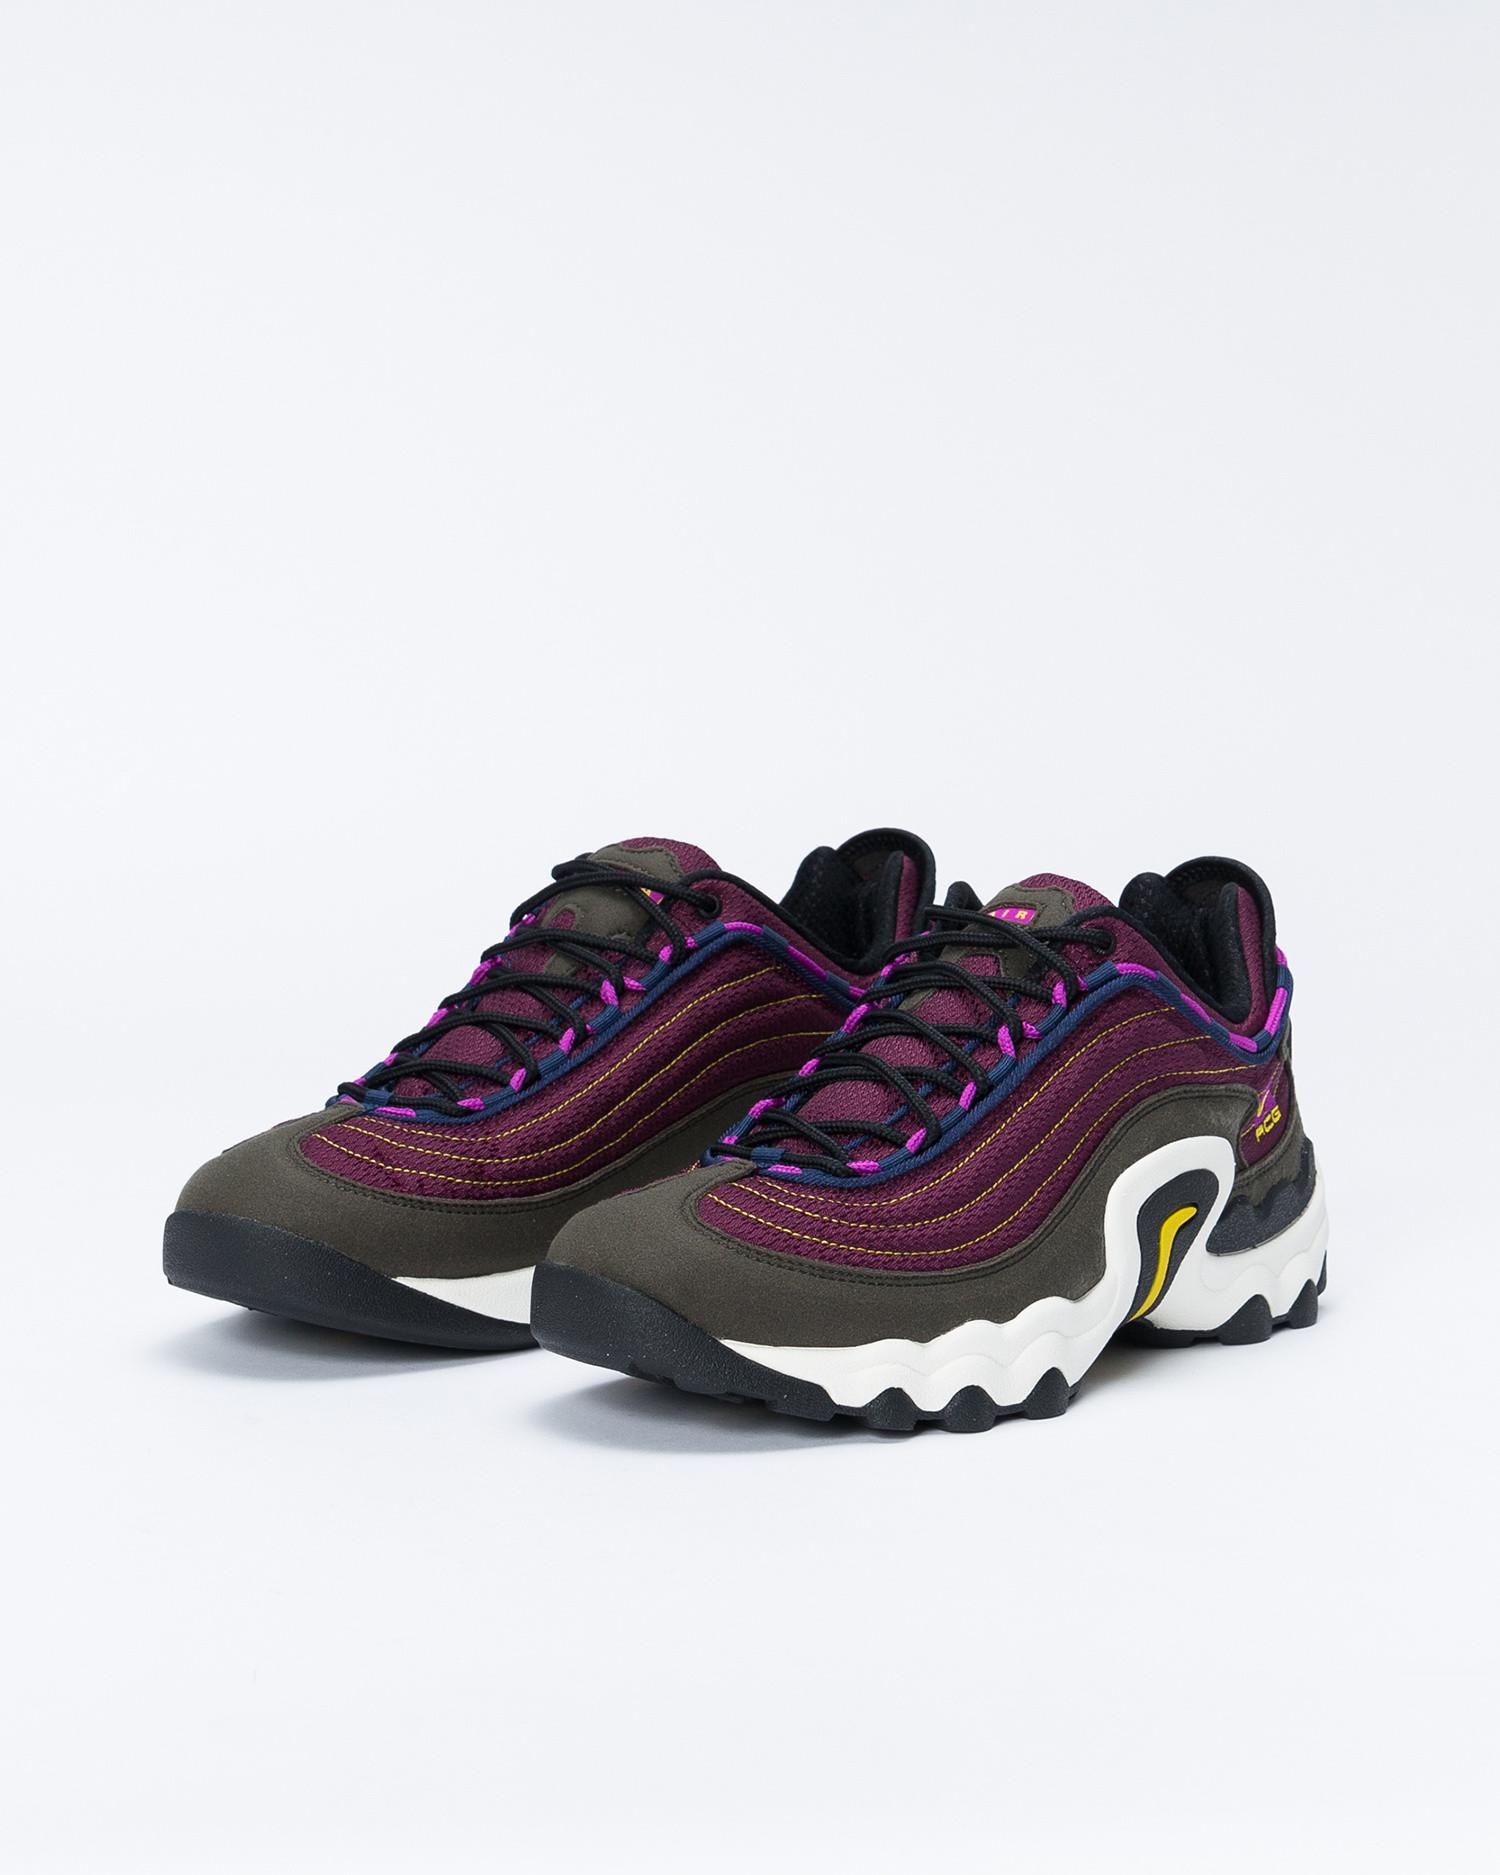 Nike ACG Air Skarn Sequoia / Vivid Purple - Bright Citron